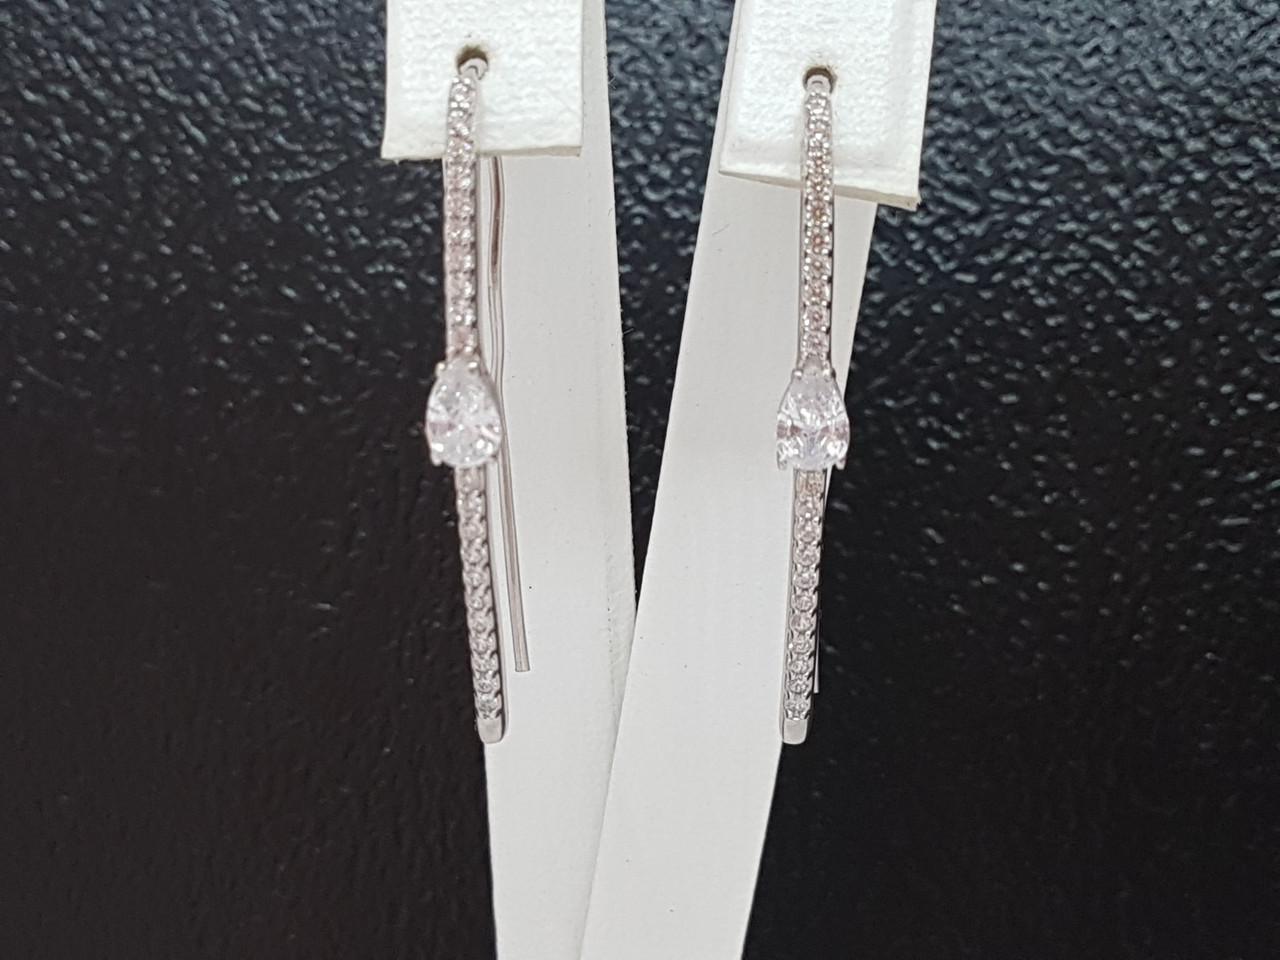 Серебряные серьги Лаунж. Артикул 2905/9Р-CZ